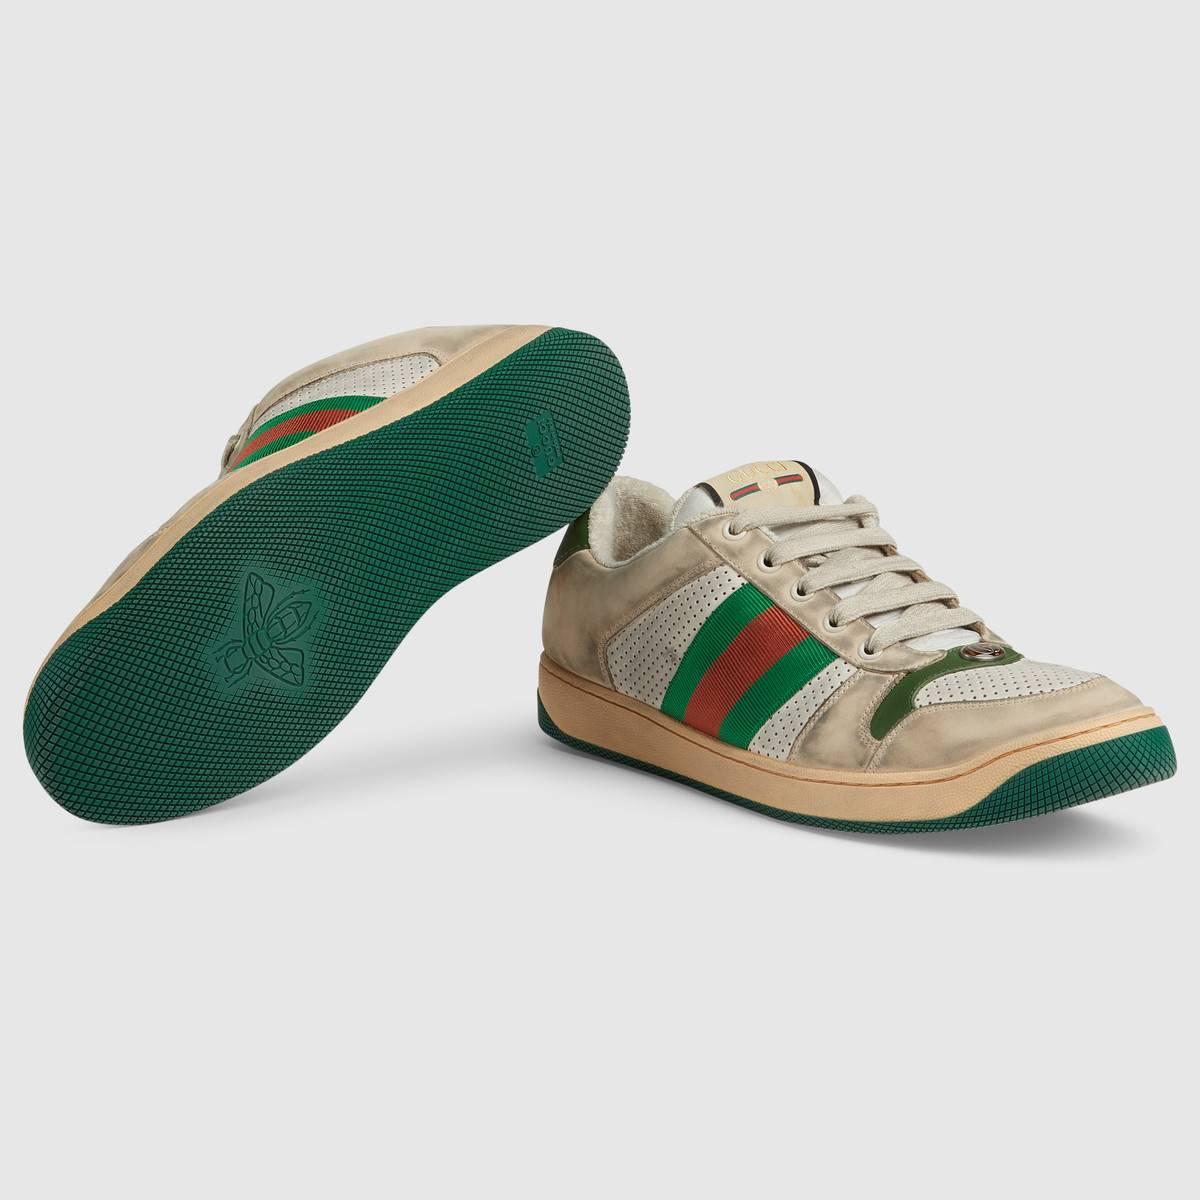 gucci pre-worn shoes